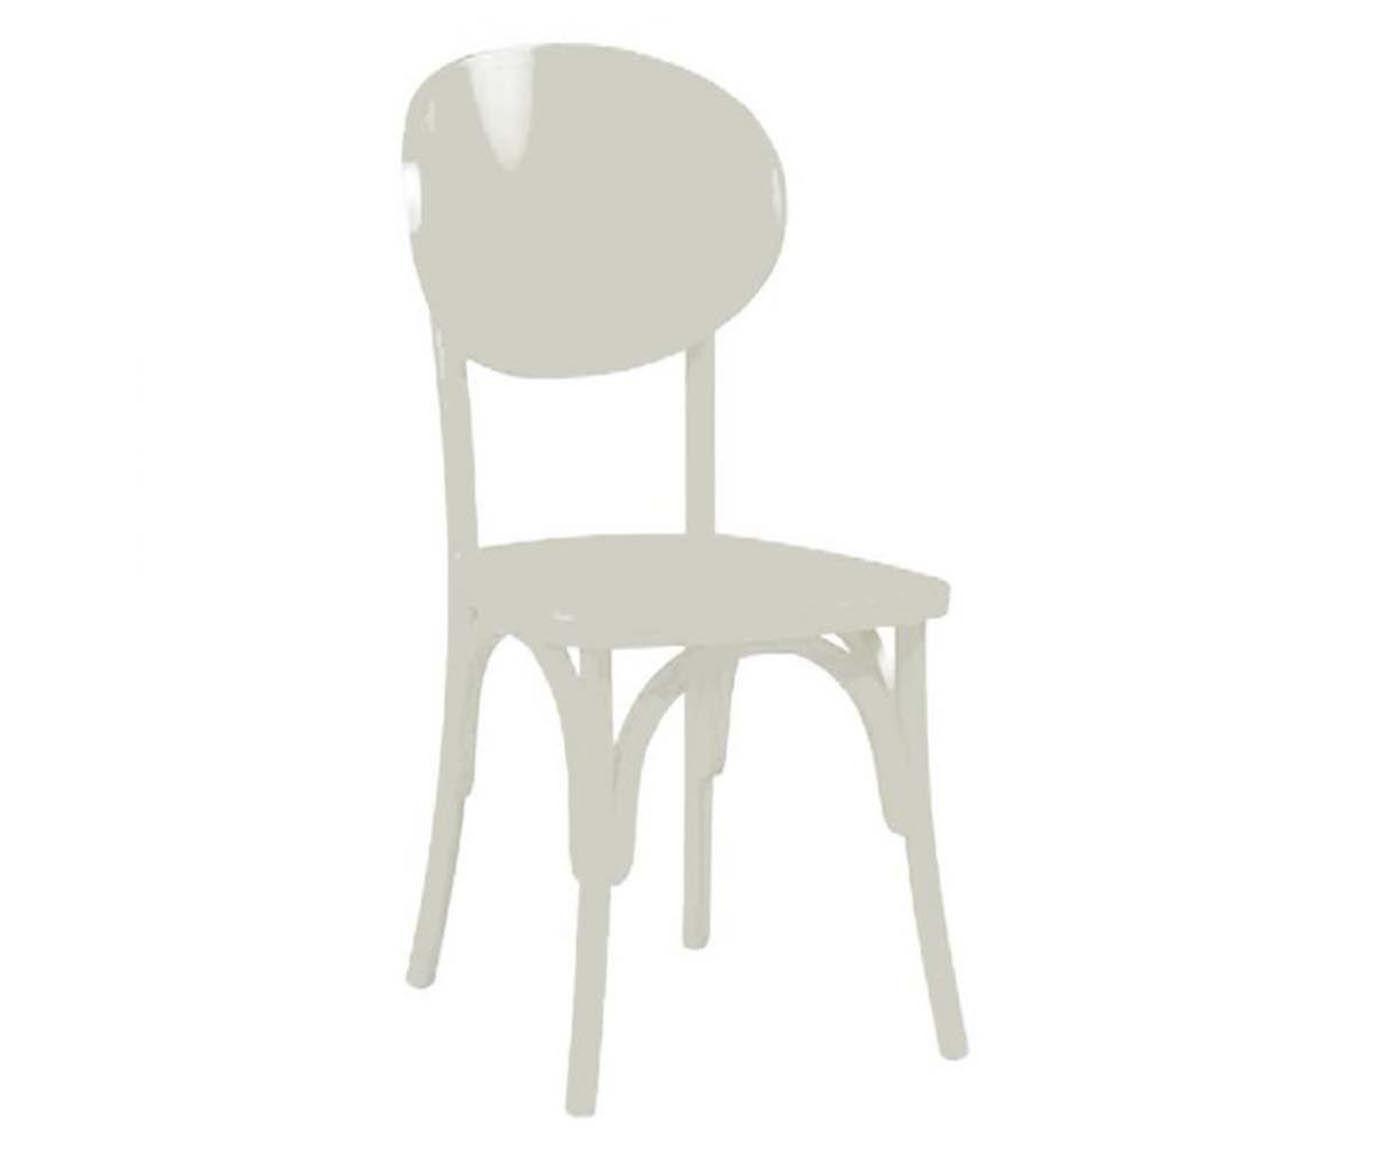 Cadeira romarin round - union | Westwing.com.br